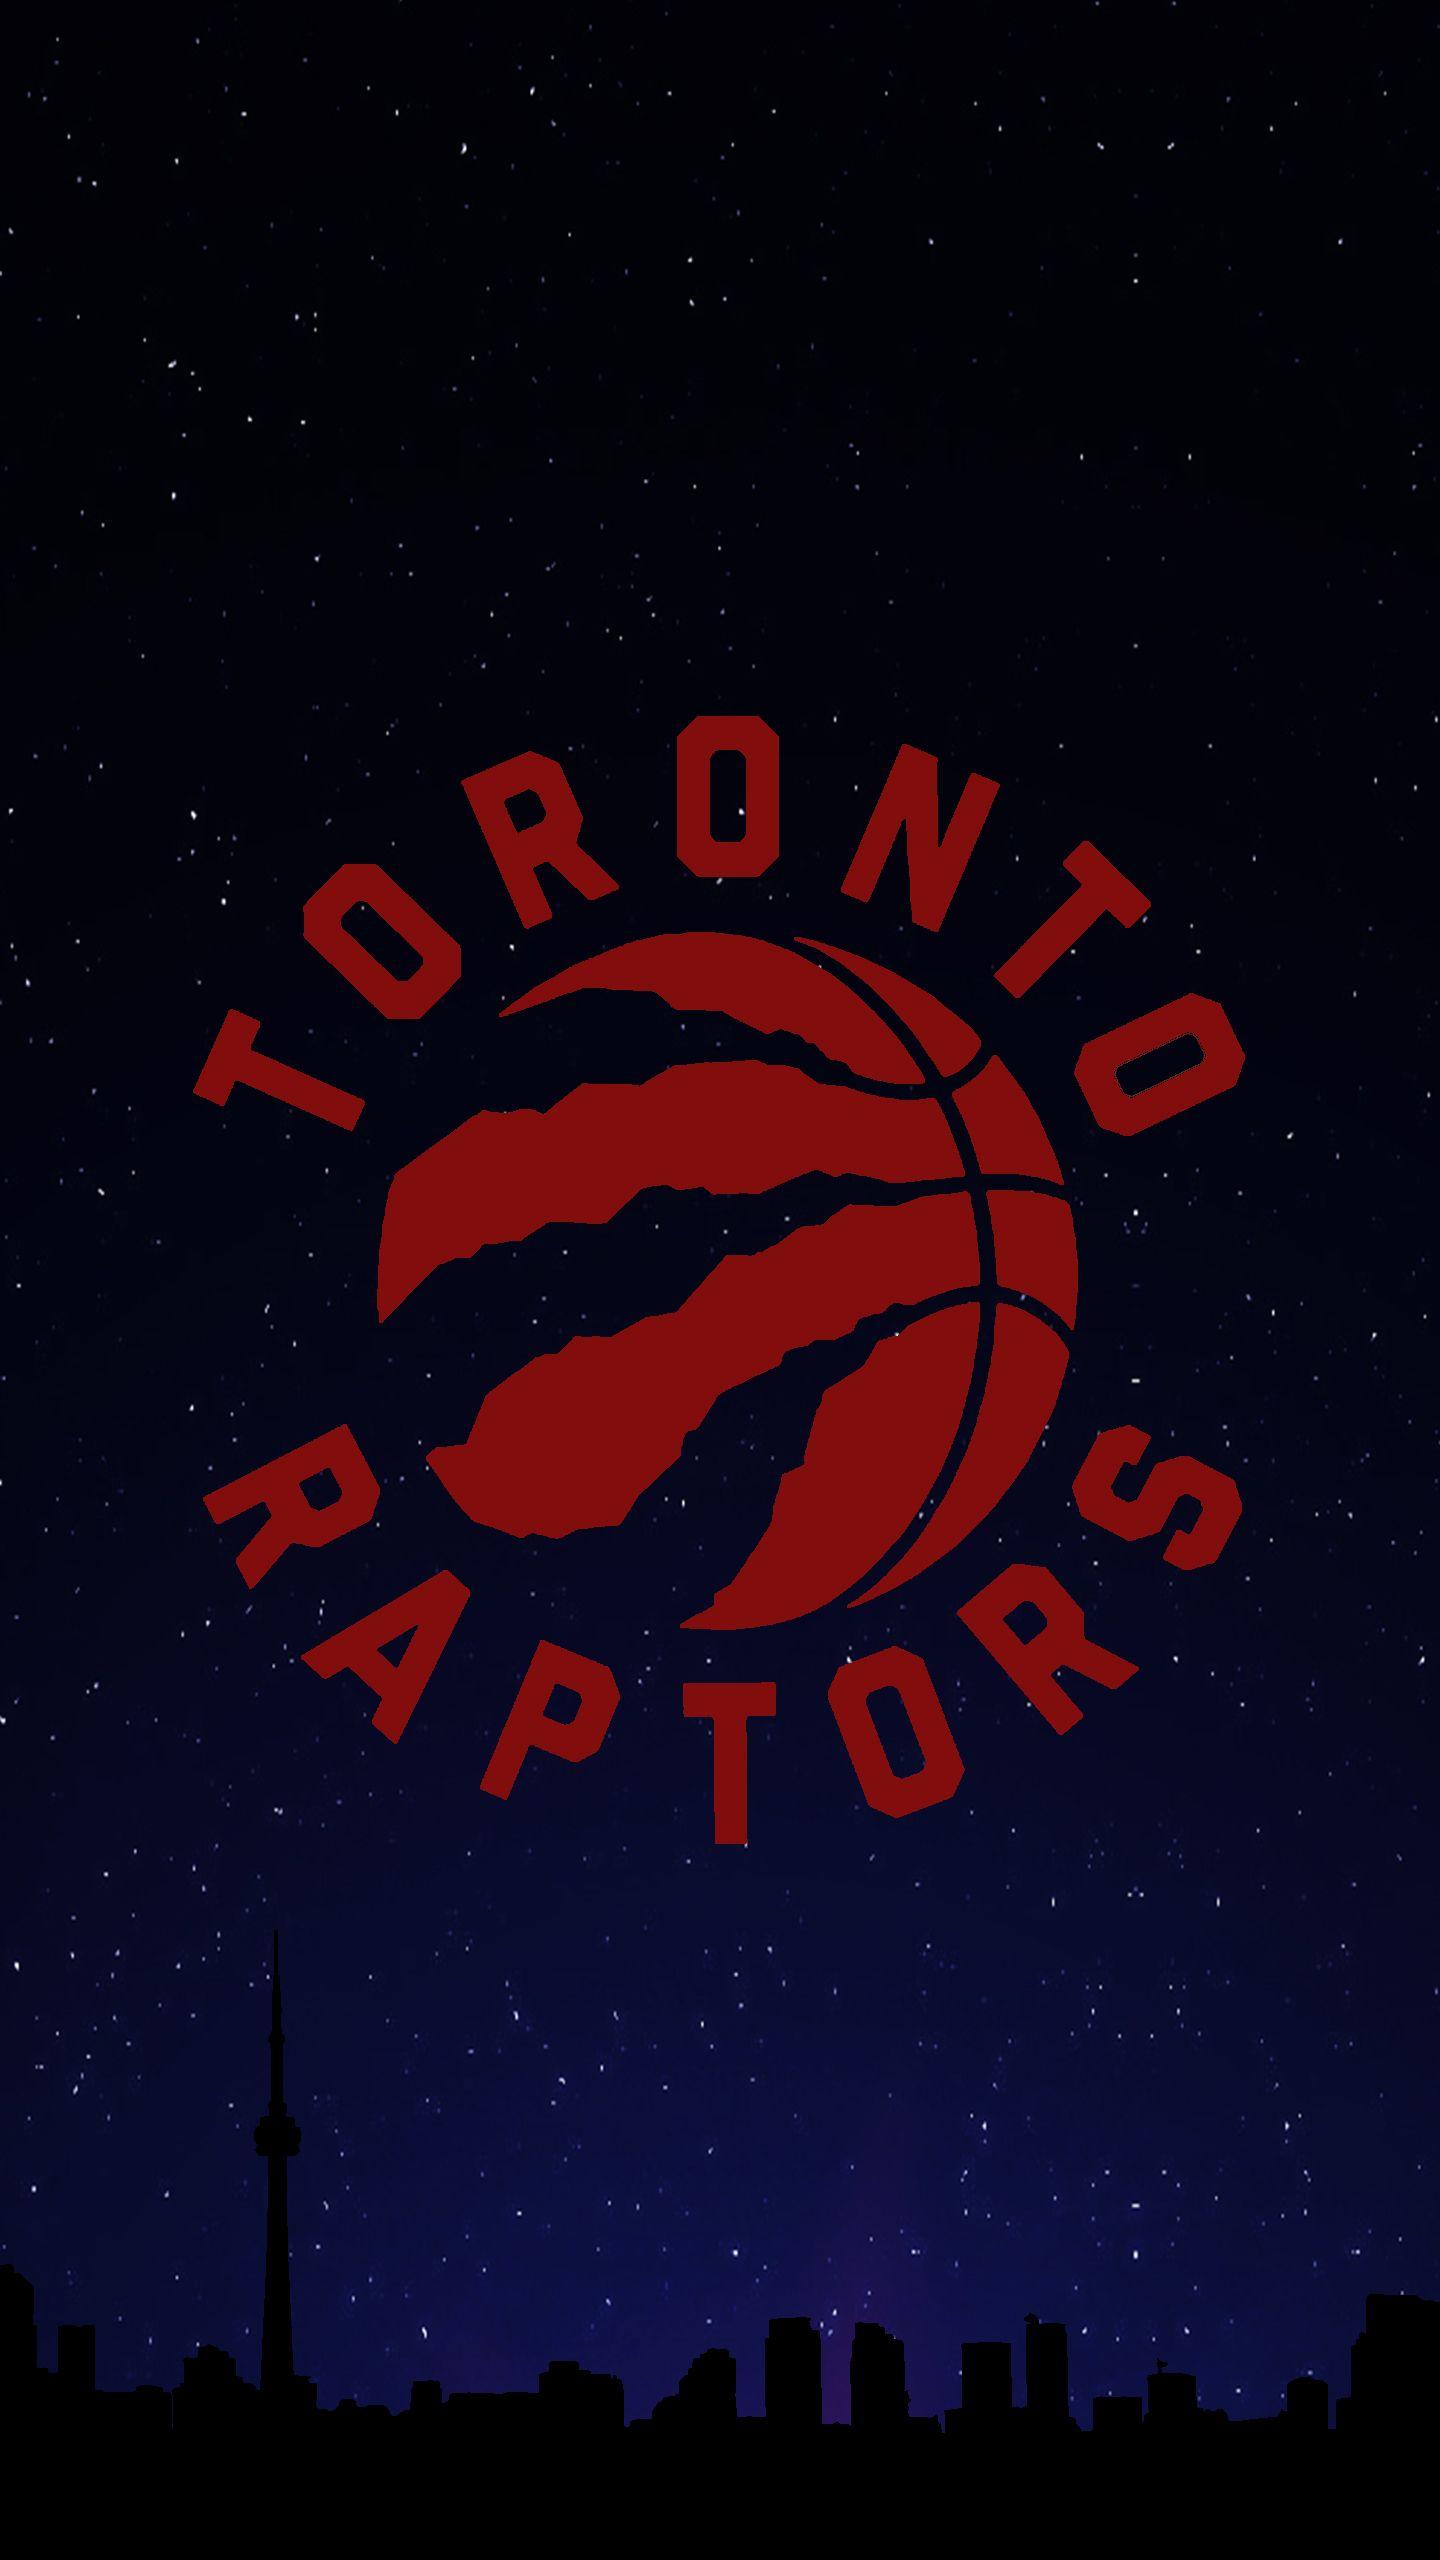 Created Some Toronto Raptors Phone Wallpaper - Toronto Raptors Iphone Background , HD Wallpaper & Backgrounds